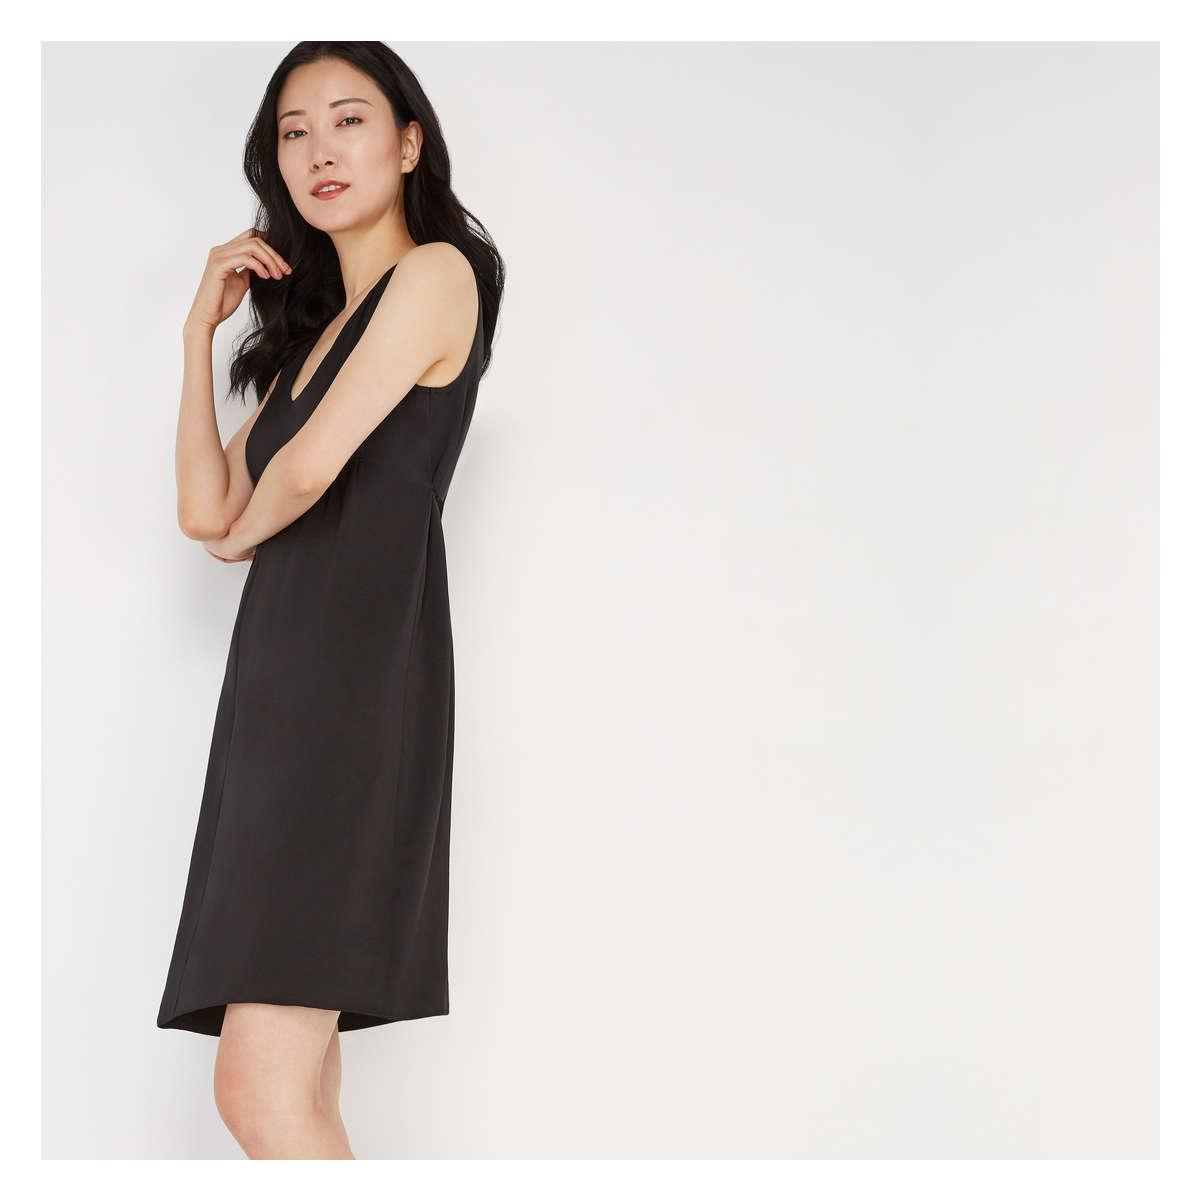 57a826db3fb72 Lyst - Joe Fresh Hammered Satin Sleeveless Dress in Black